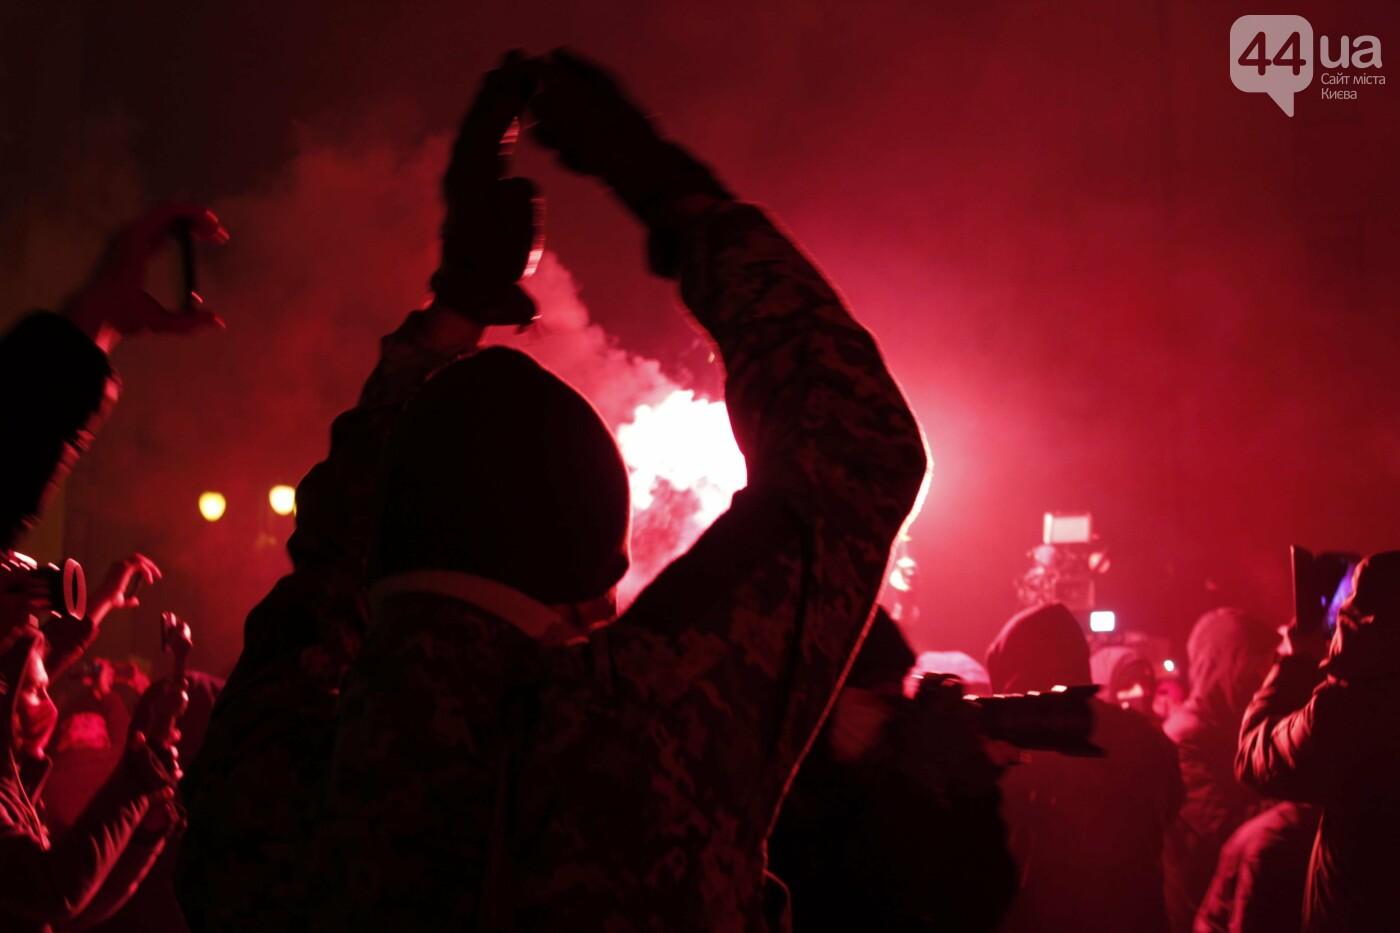 Сожгли табличку и разбили окна: акция в поддержку Стерненко переросла в беспорядки, - ФОТО, фото-12, Фото: 44.ua